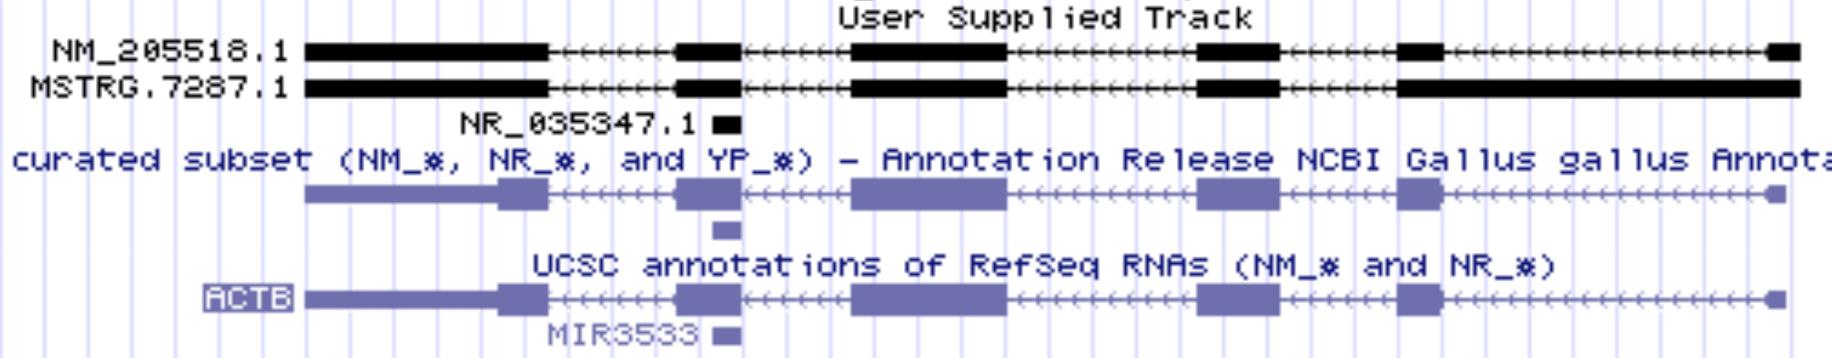 Custom track screen capture